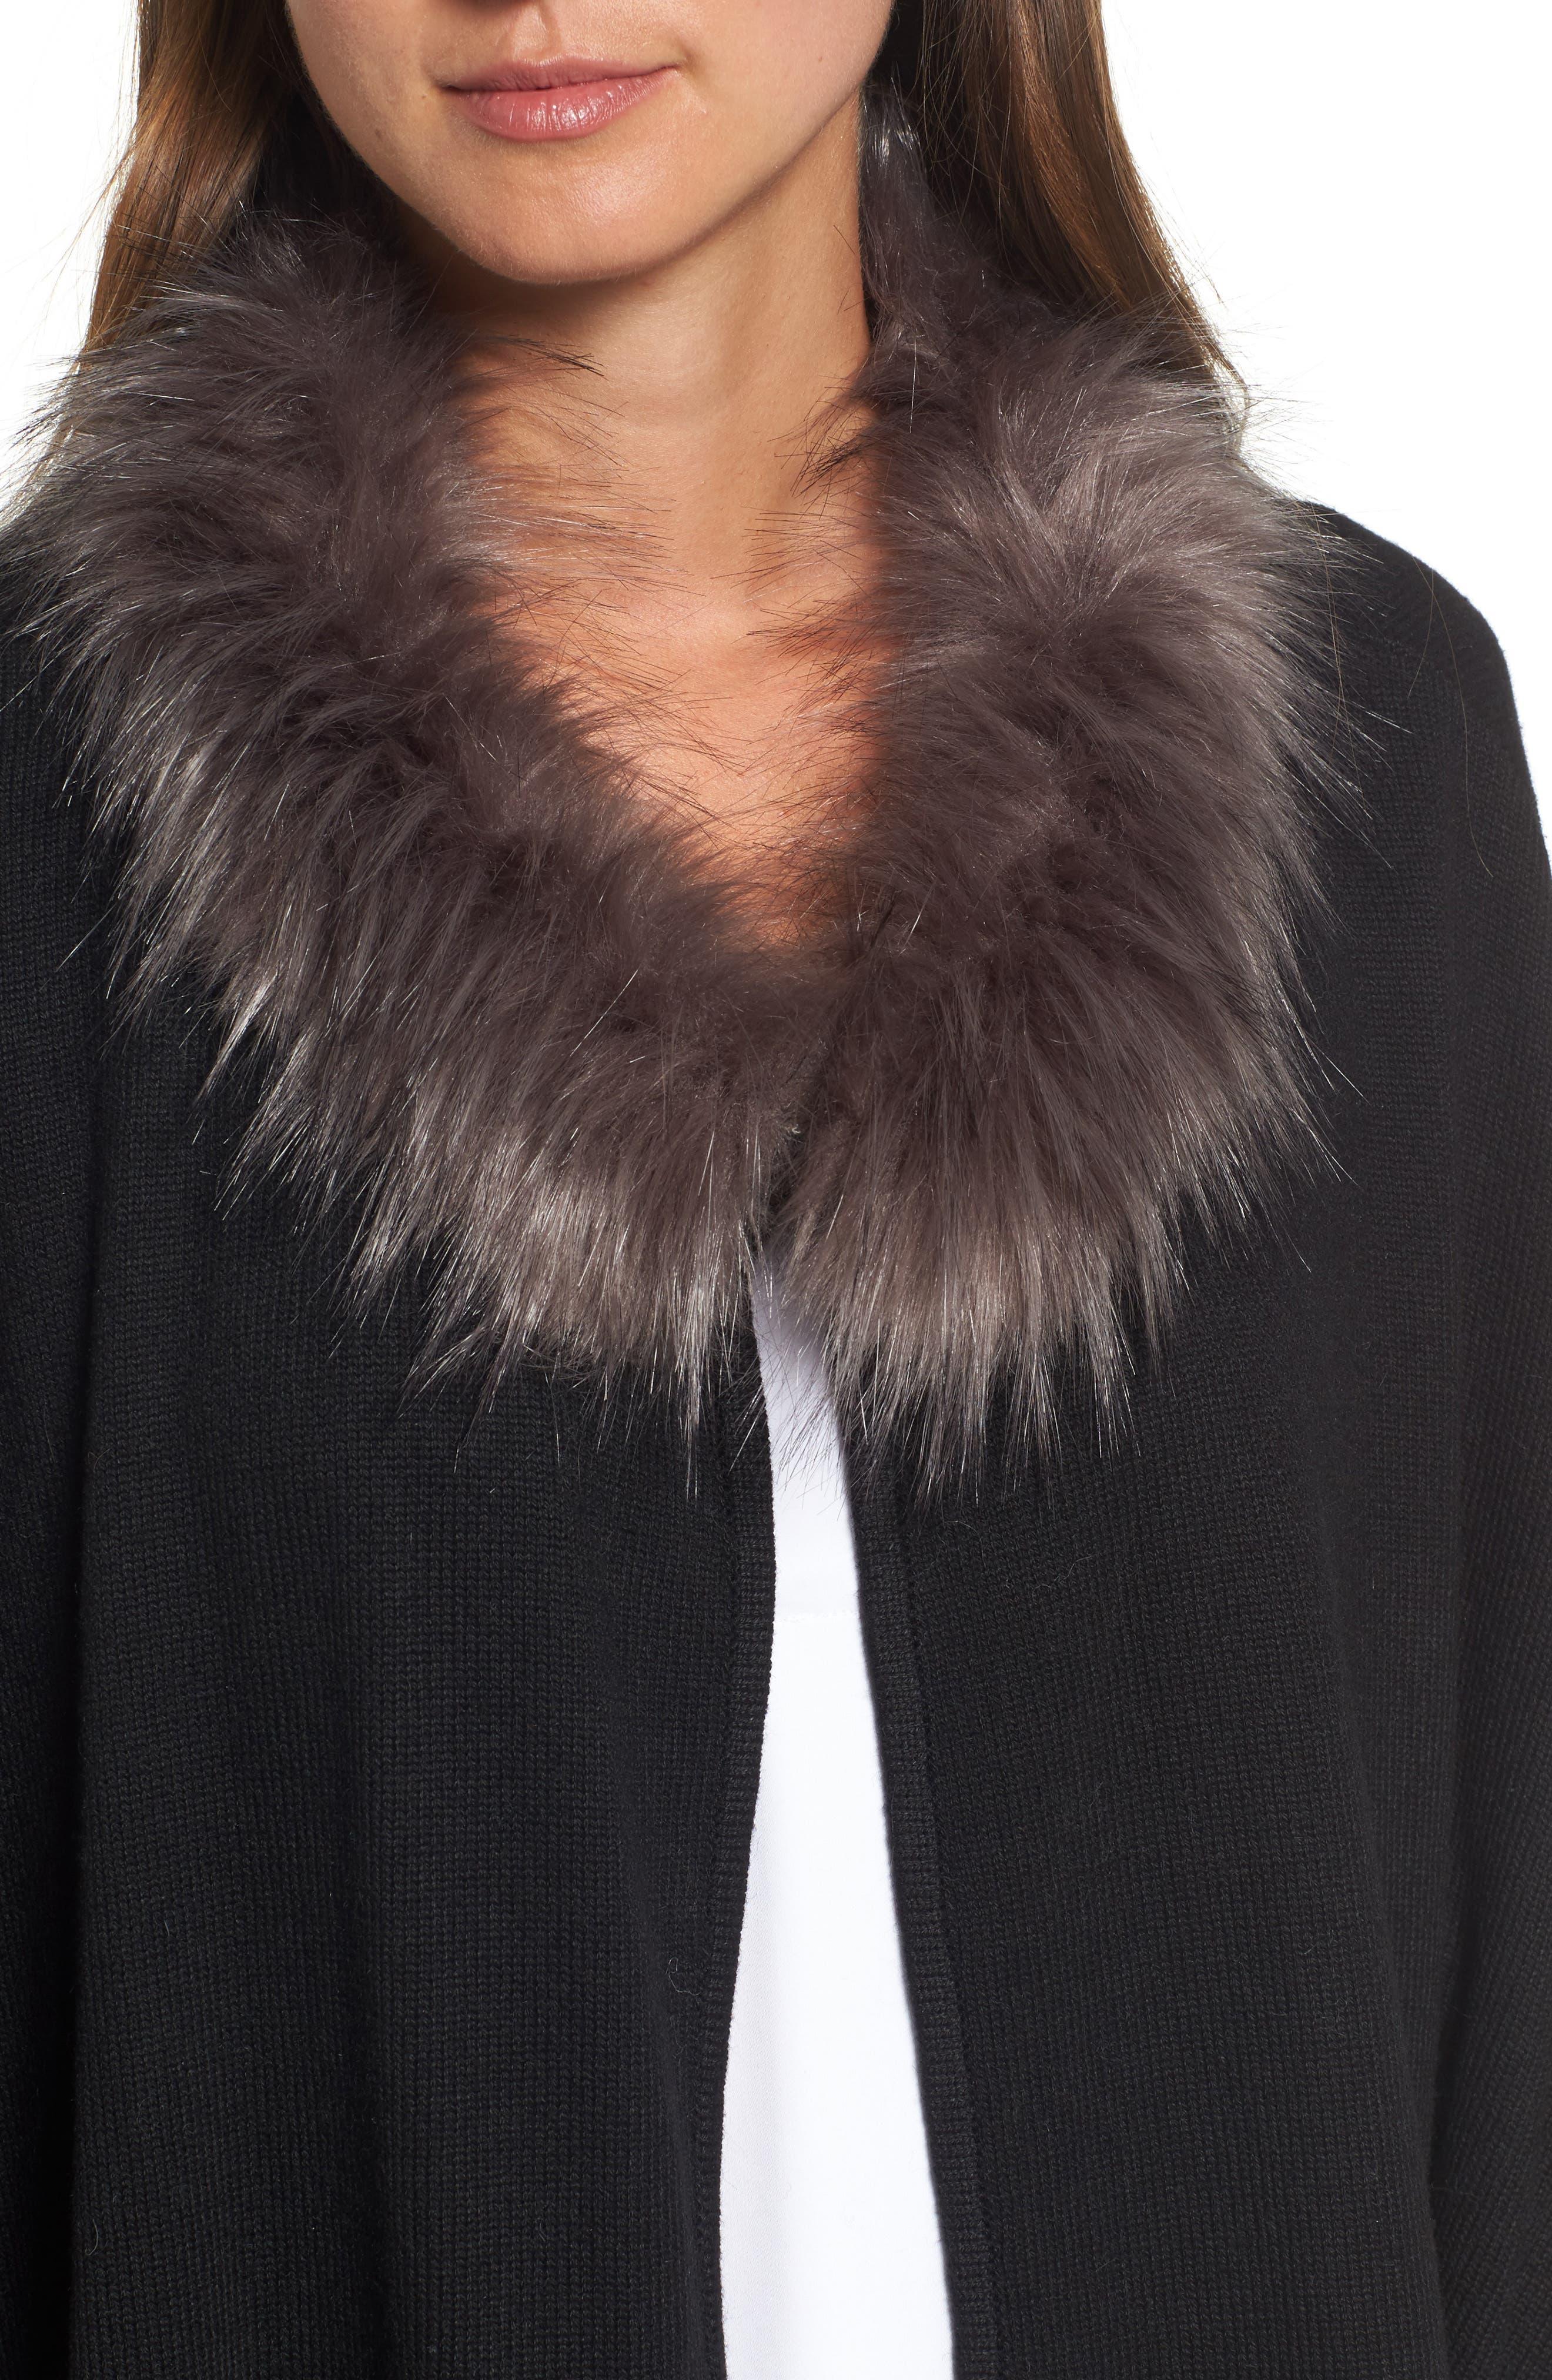 Knit Poncho with Faux Fur Trim,                             Alternate thumbnail 4, color,                             001